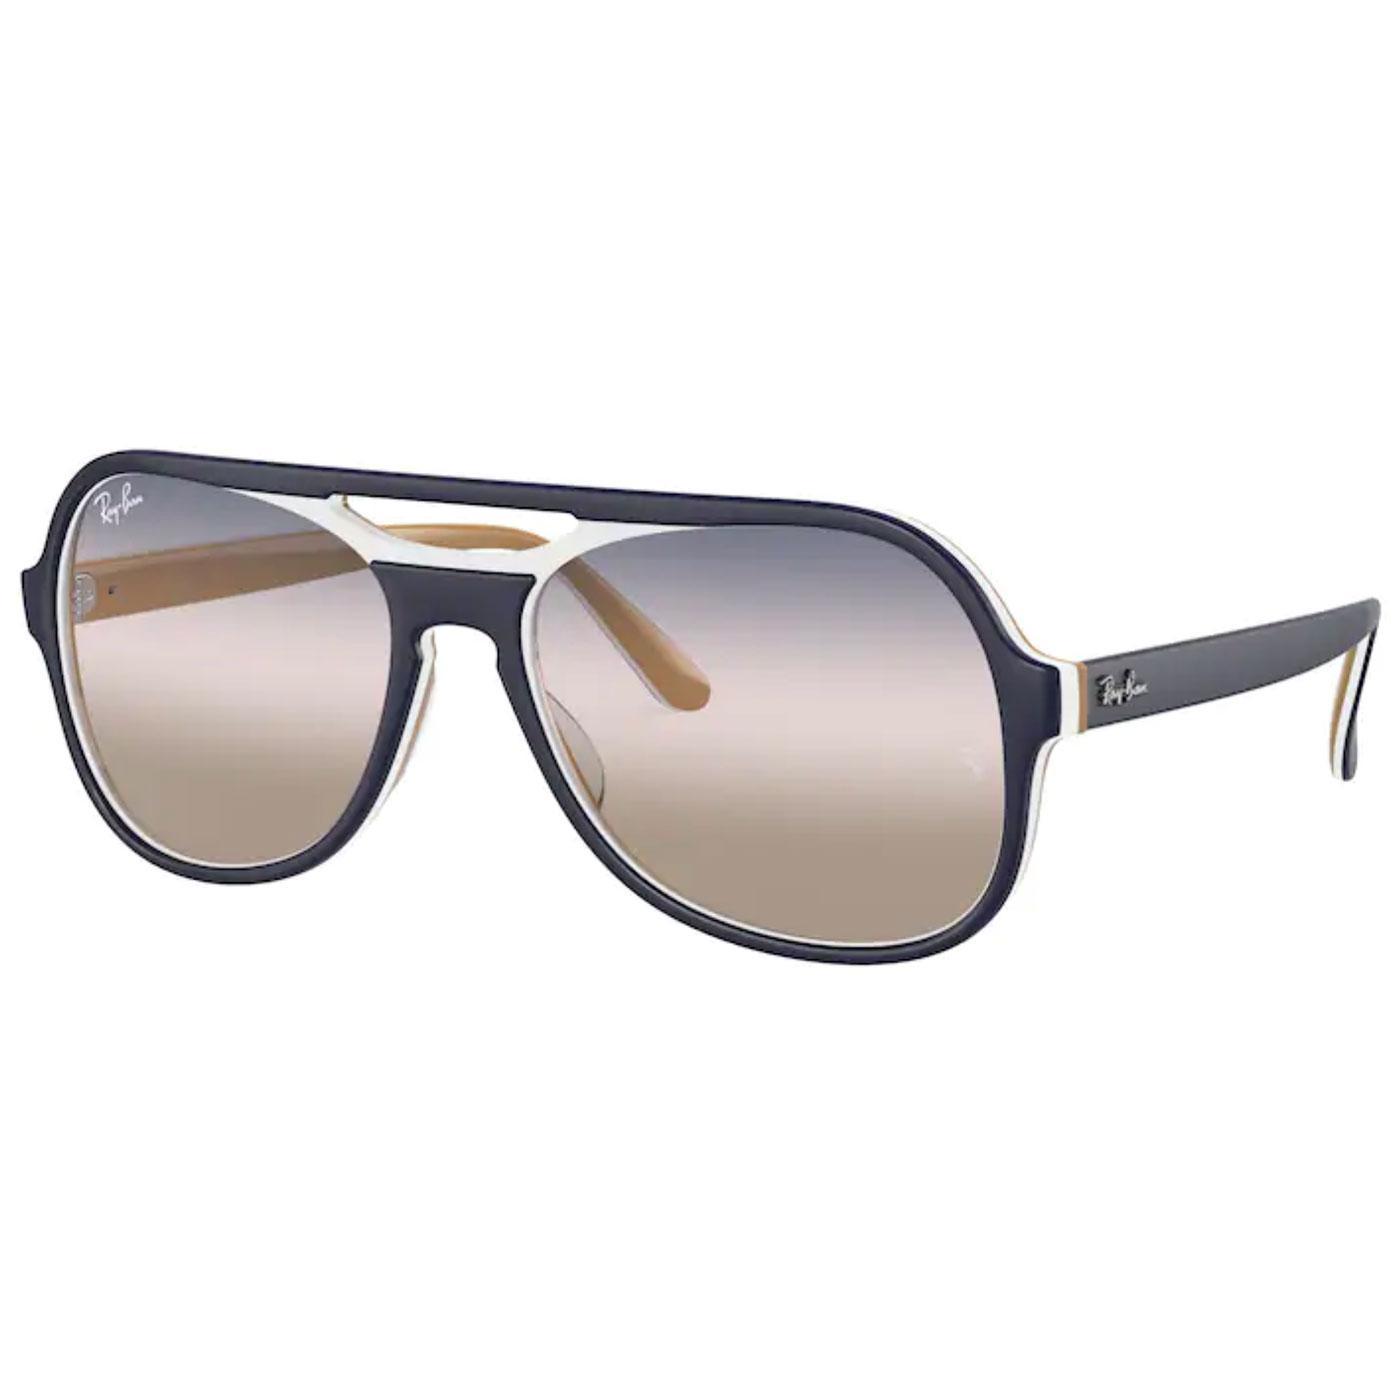 Powderhorn RAY-BAN 70s 2-Tone Aviator Sunglasses C